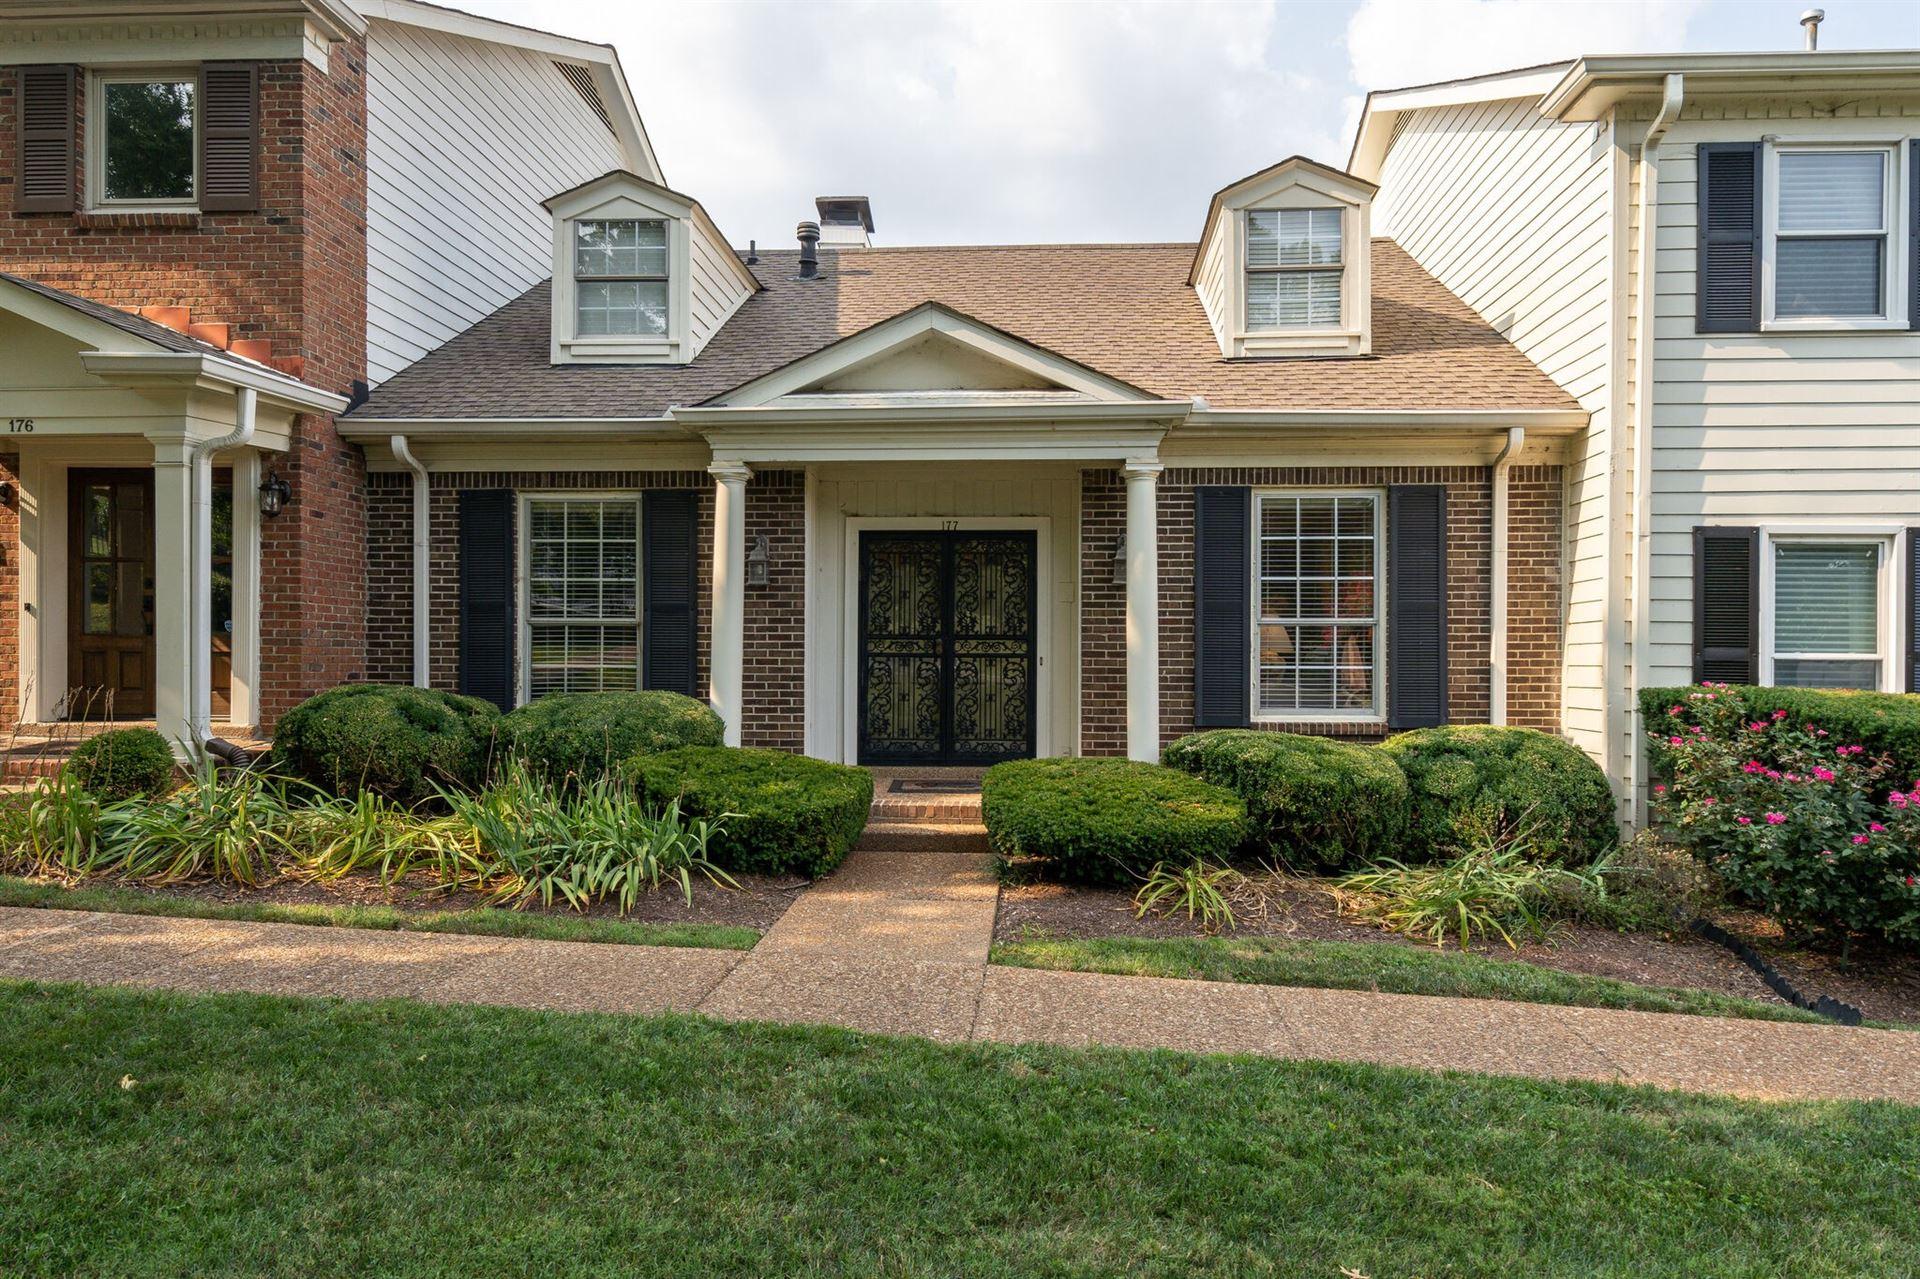 177 Jefferson Sq, Nashville, TN 37215 - MLS#: 2285762